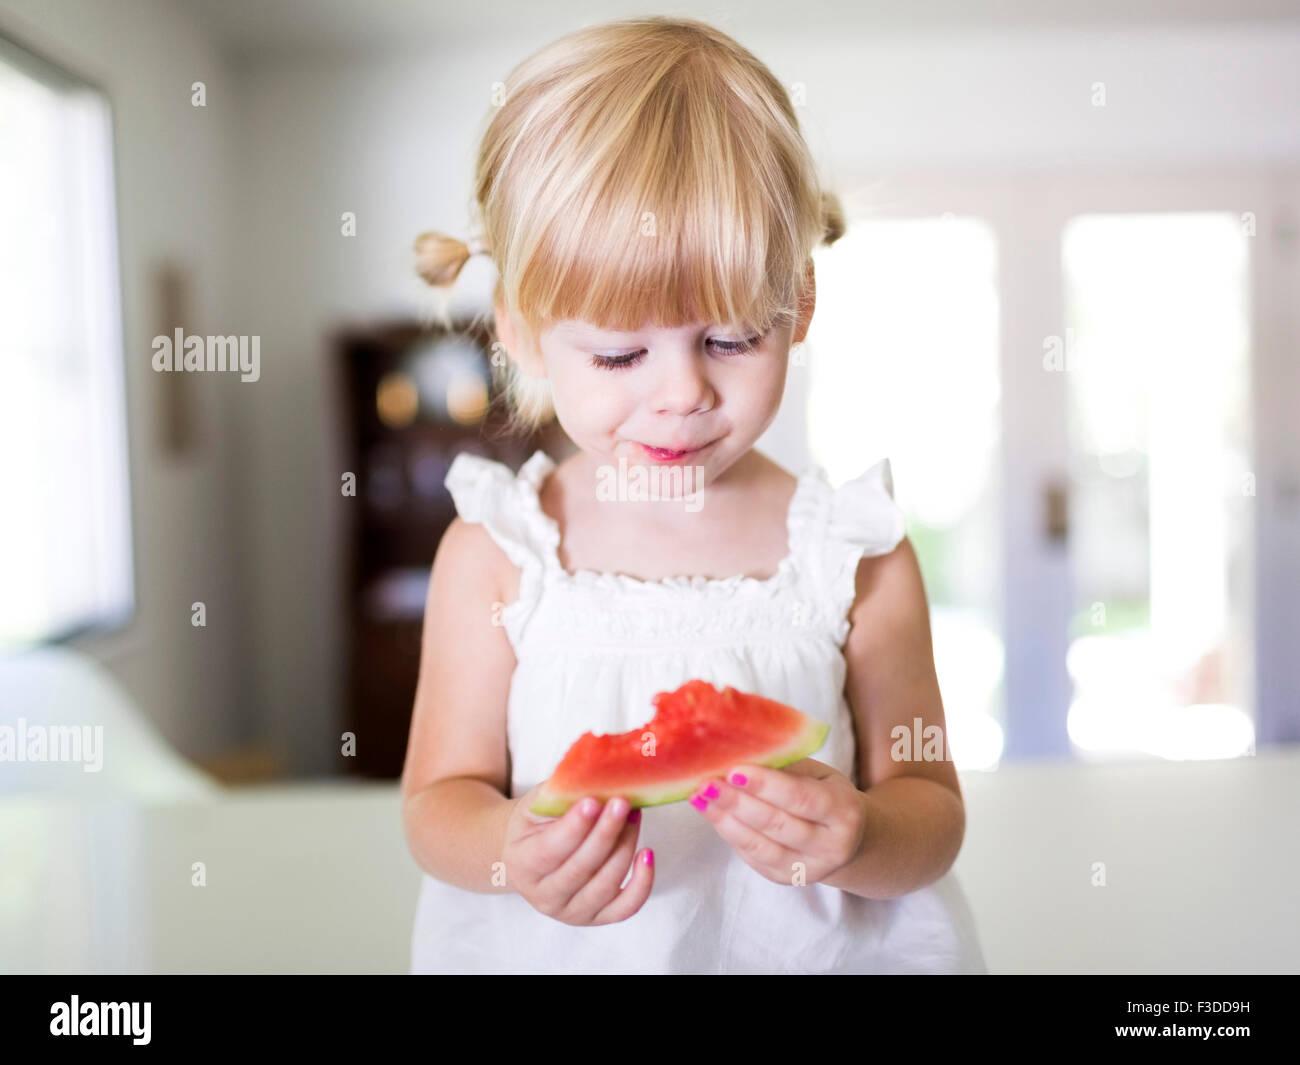 Portrait of Girl (2-3) eating watermelon Photo Stock